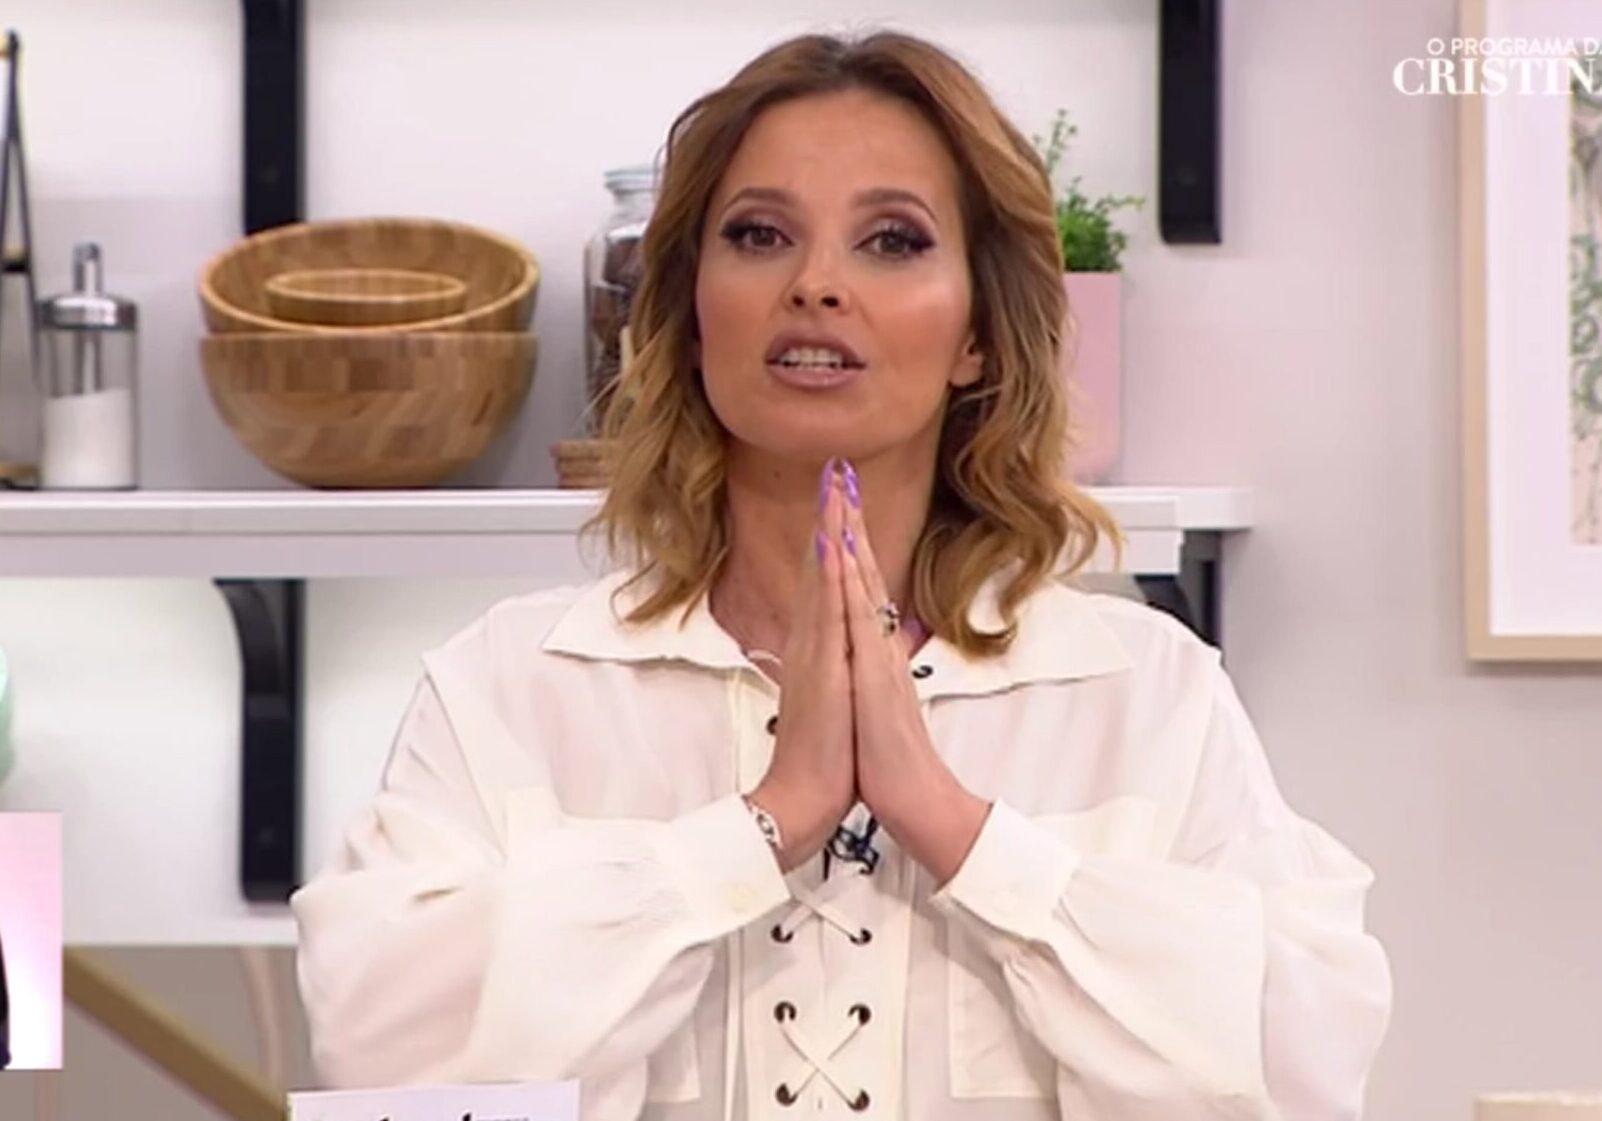 Cristina-Ferreira